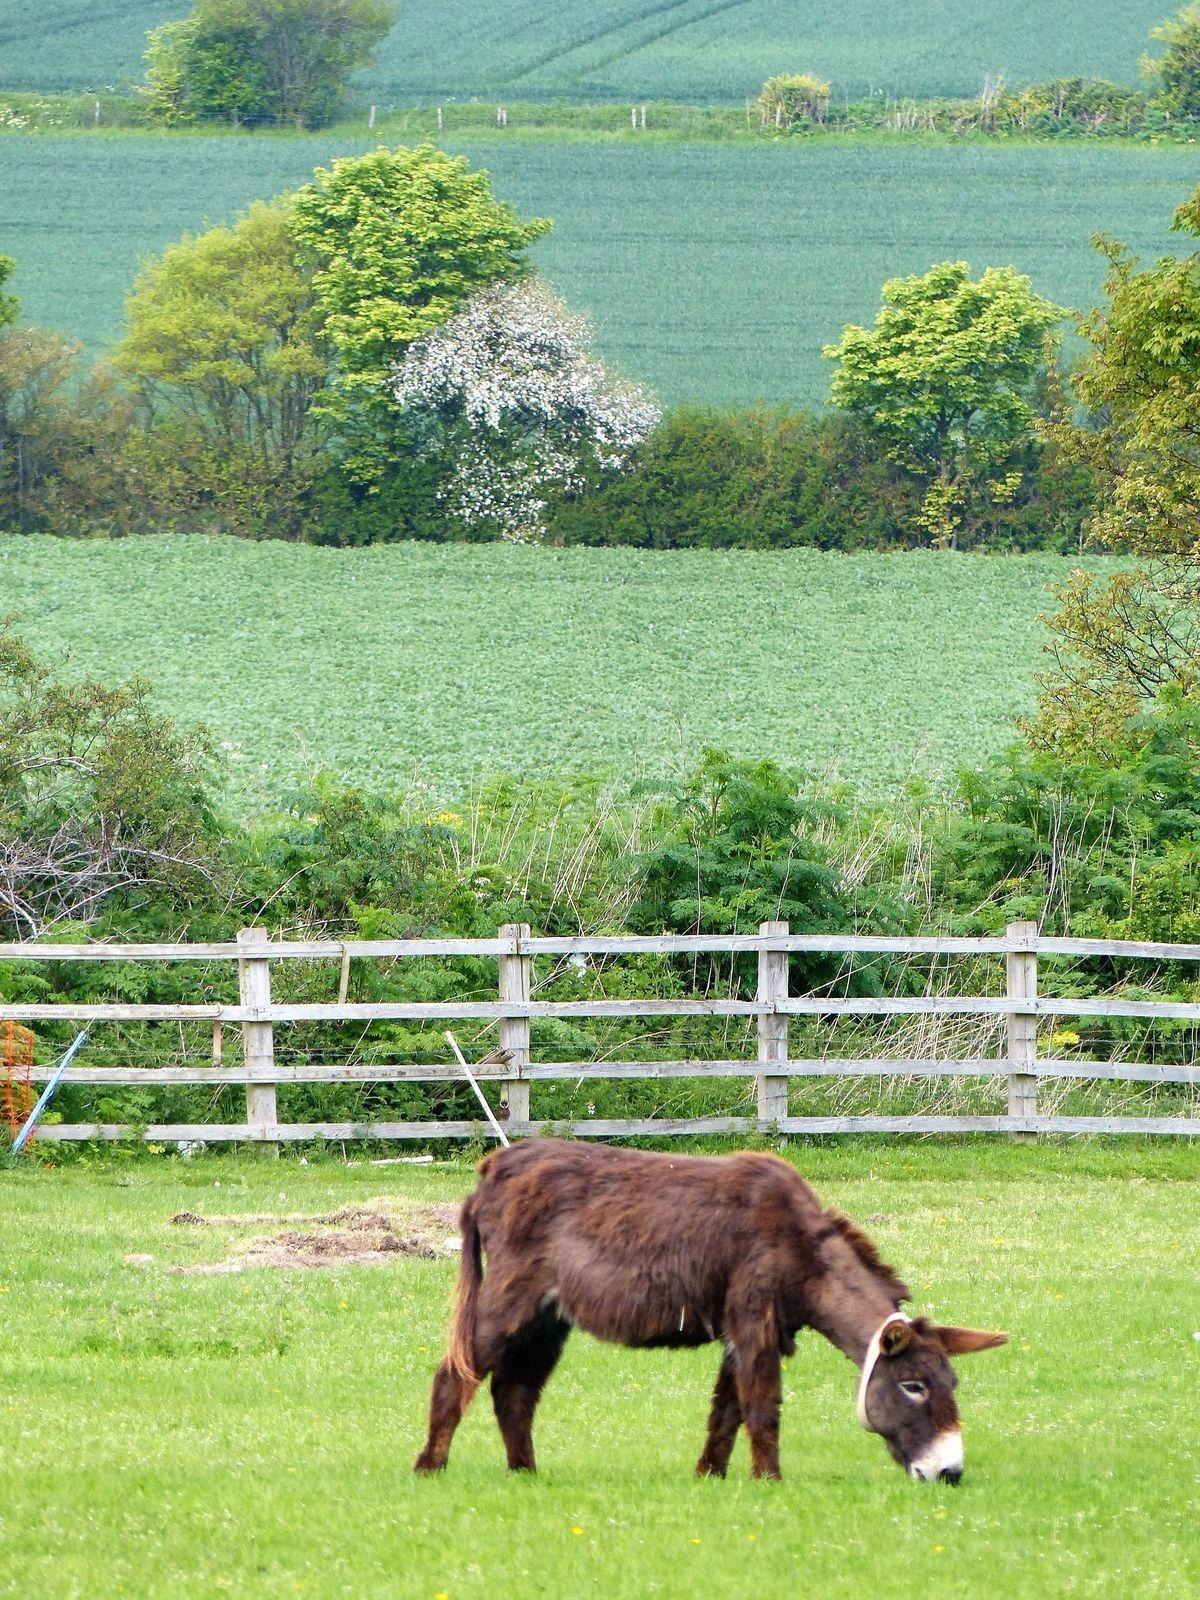 Pin by DeLynn Decker on ☆ DONKEY'S ☆ 2 | Donkey, Zorse, Male horse